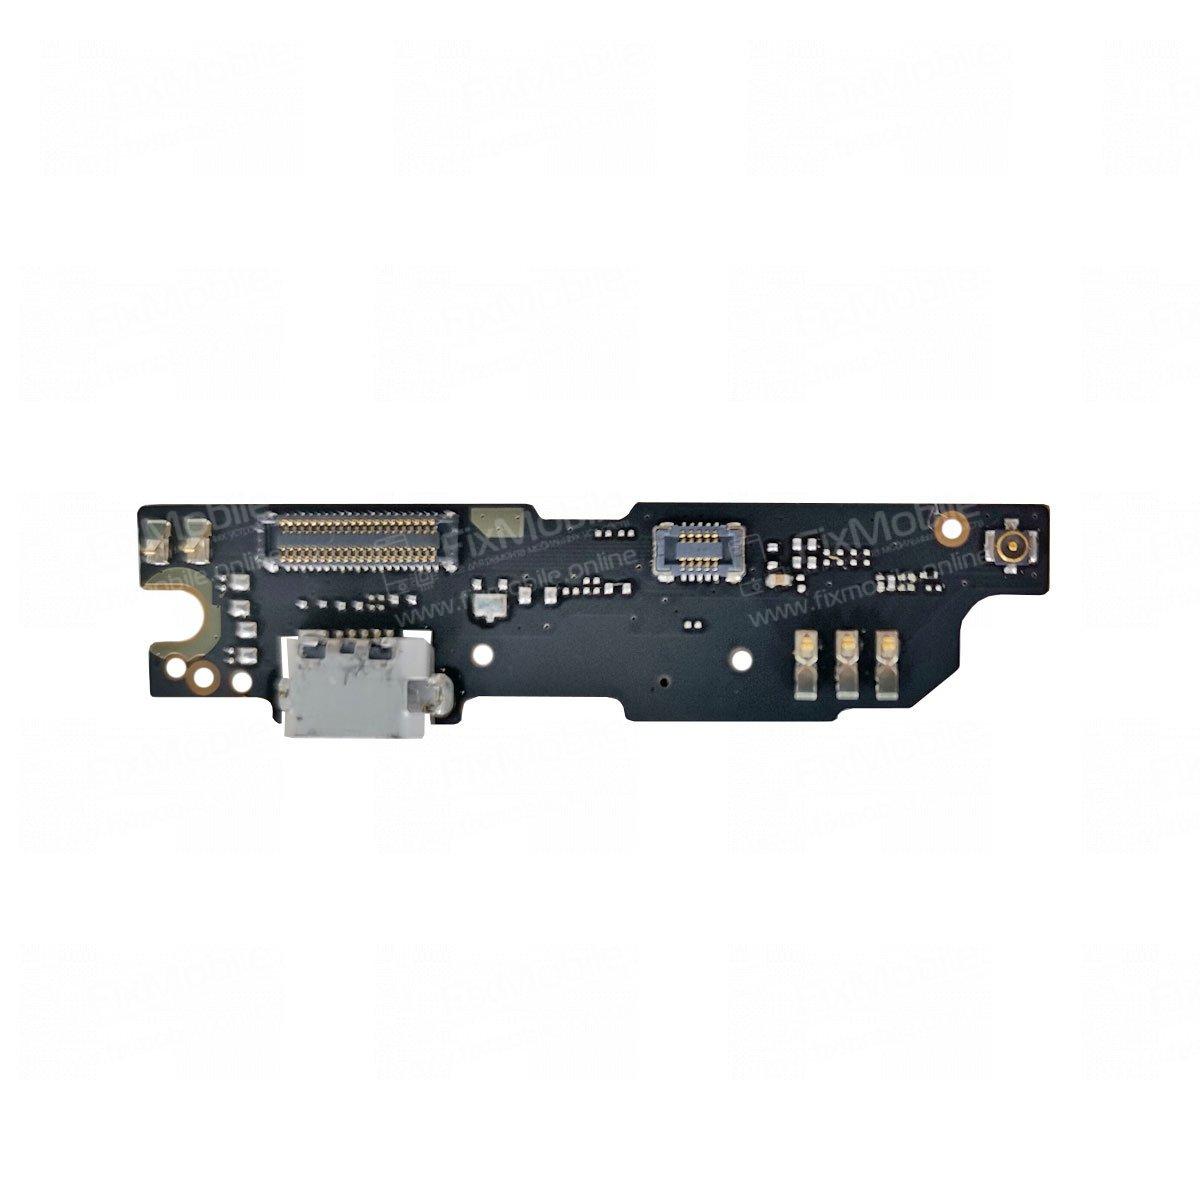 Шлейф для Meizu M3 Note M681h плата на системный разъем/микрофон/кнопку Home